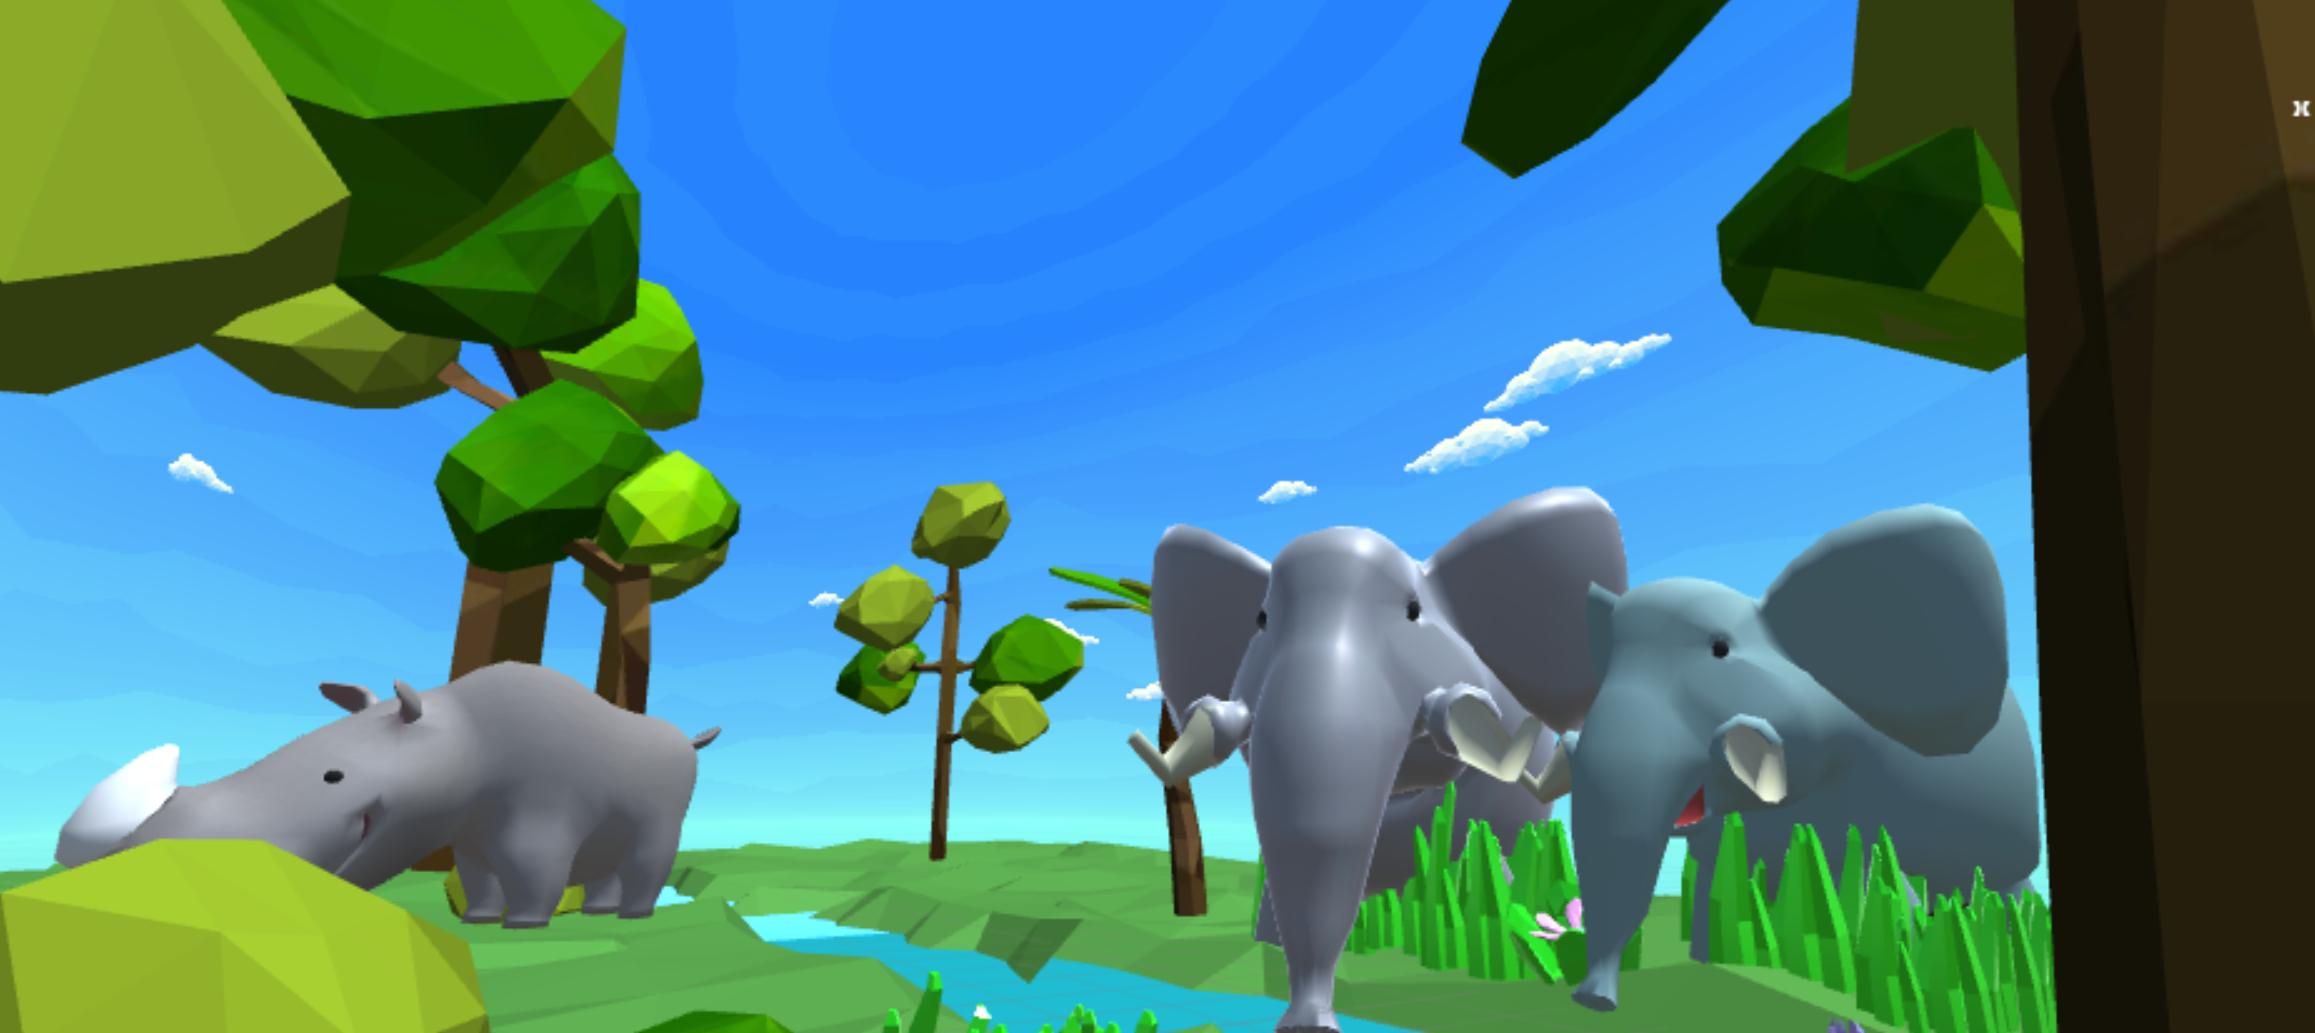 Noah's Park - AR portal to a new world